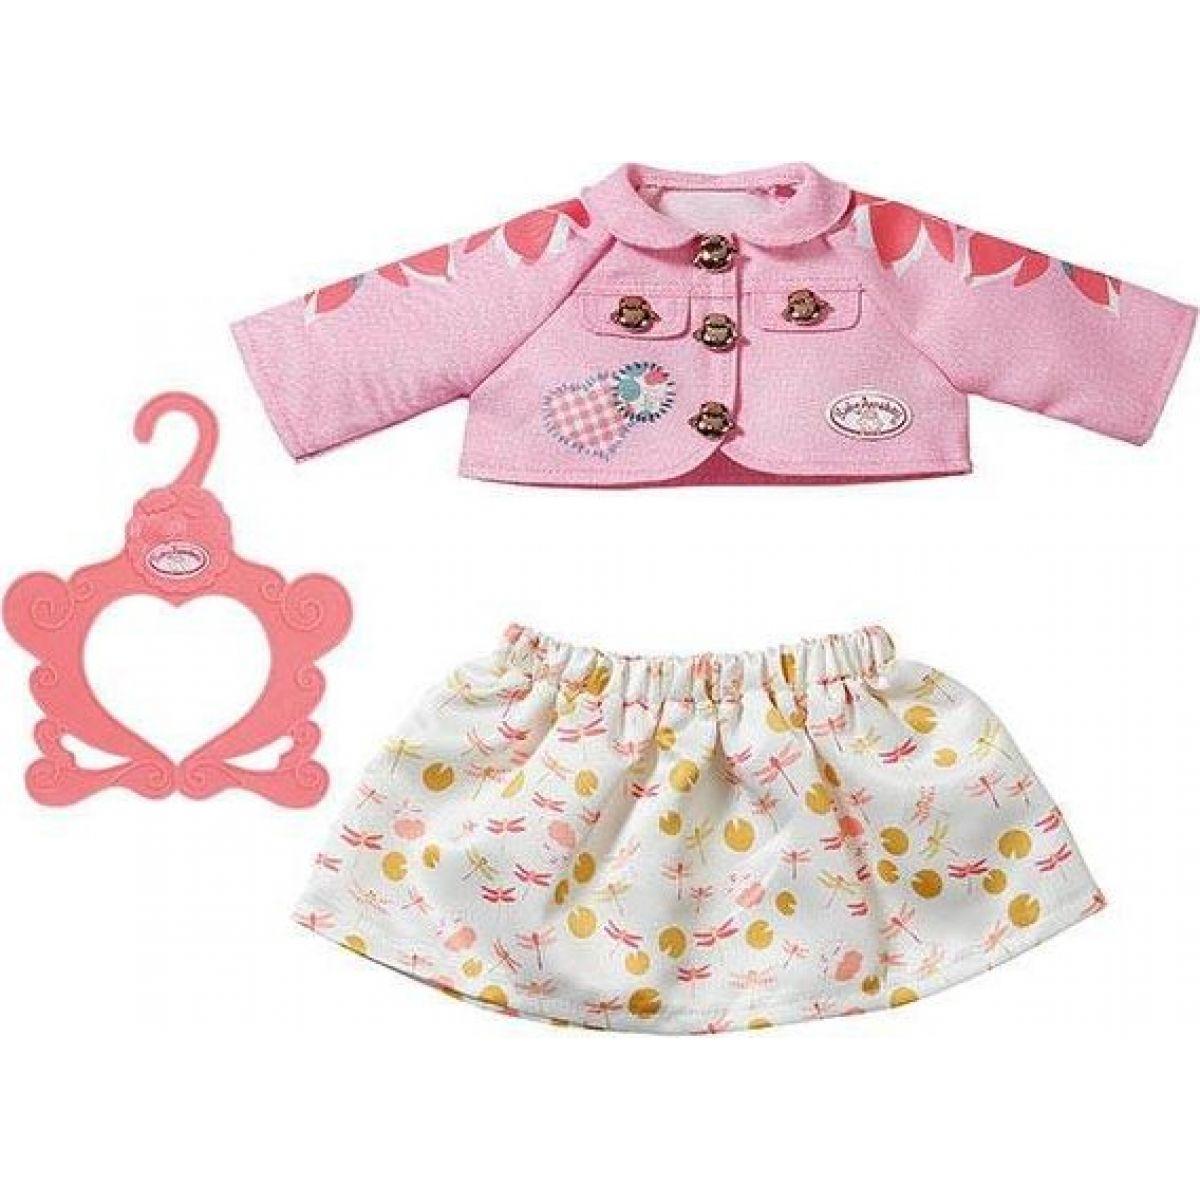 Zapf Creation Baby Annabell Oblečení 43 cm holčička